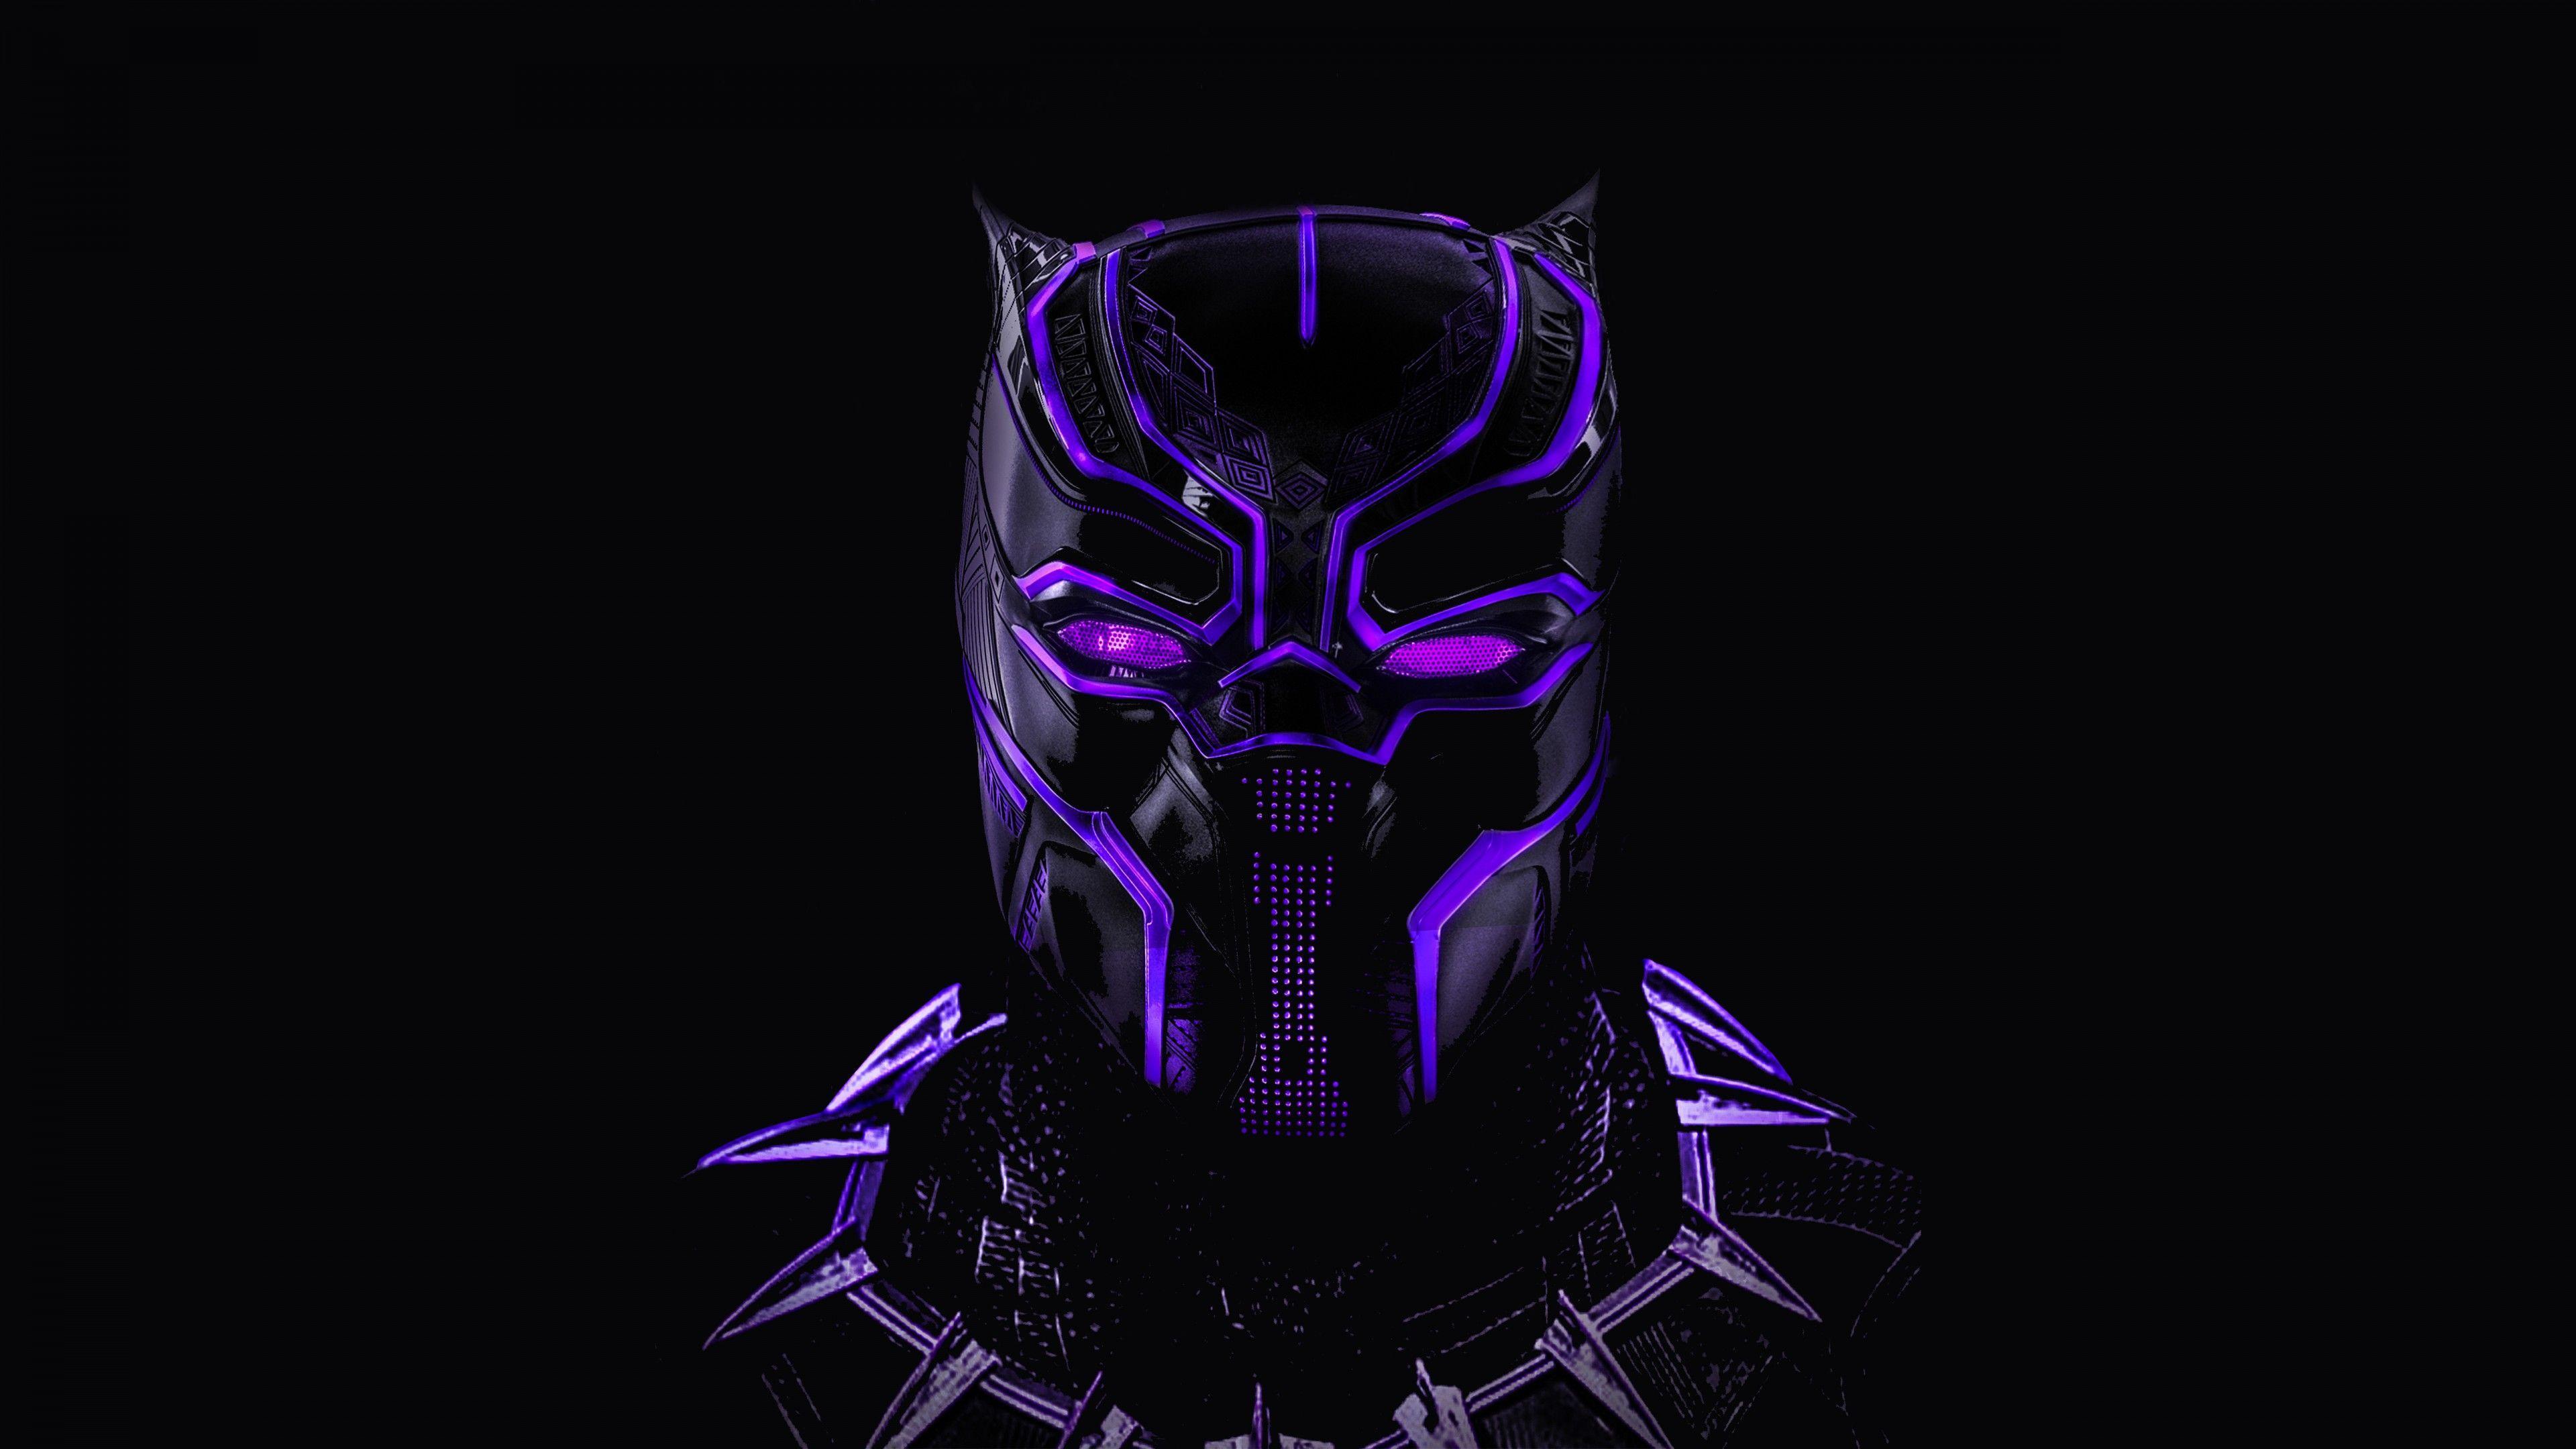 3840x2160 Black Panther Neon Artwork 5K Wallpaper